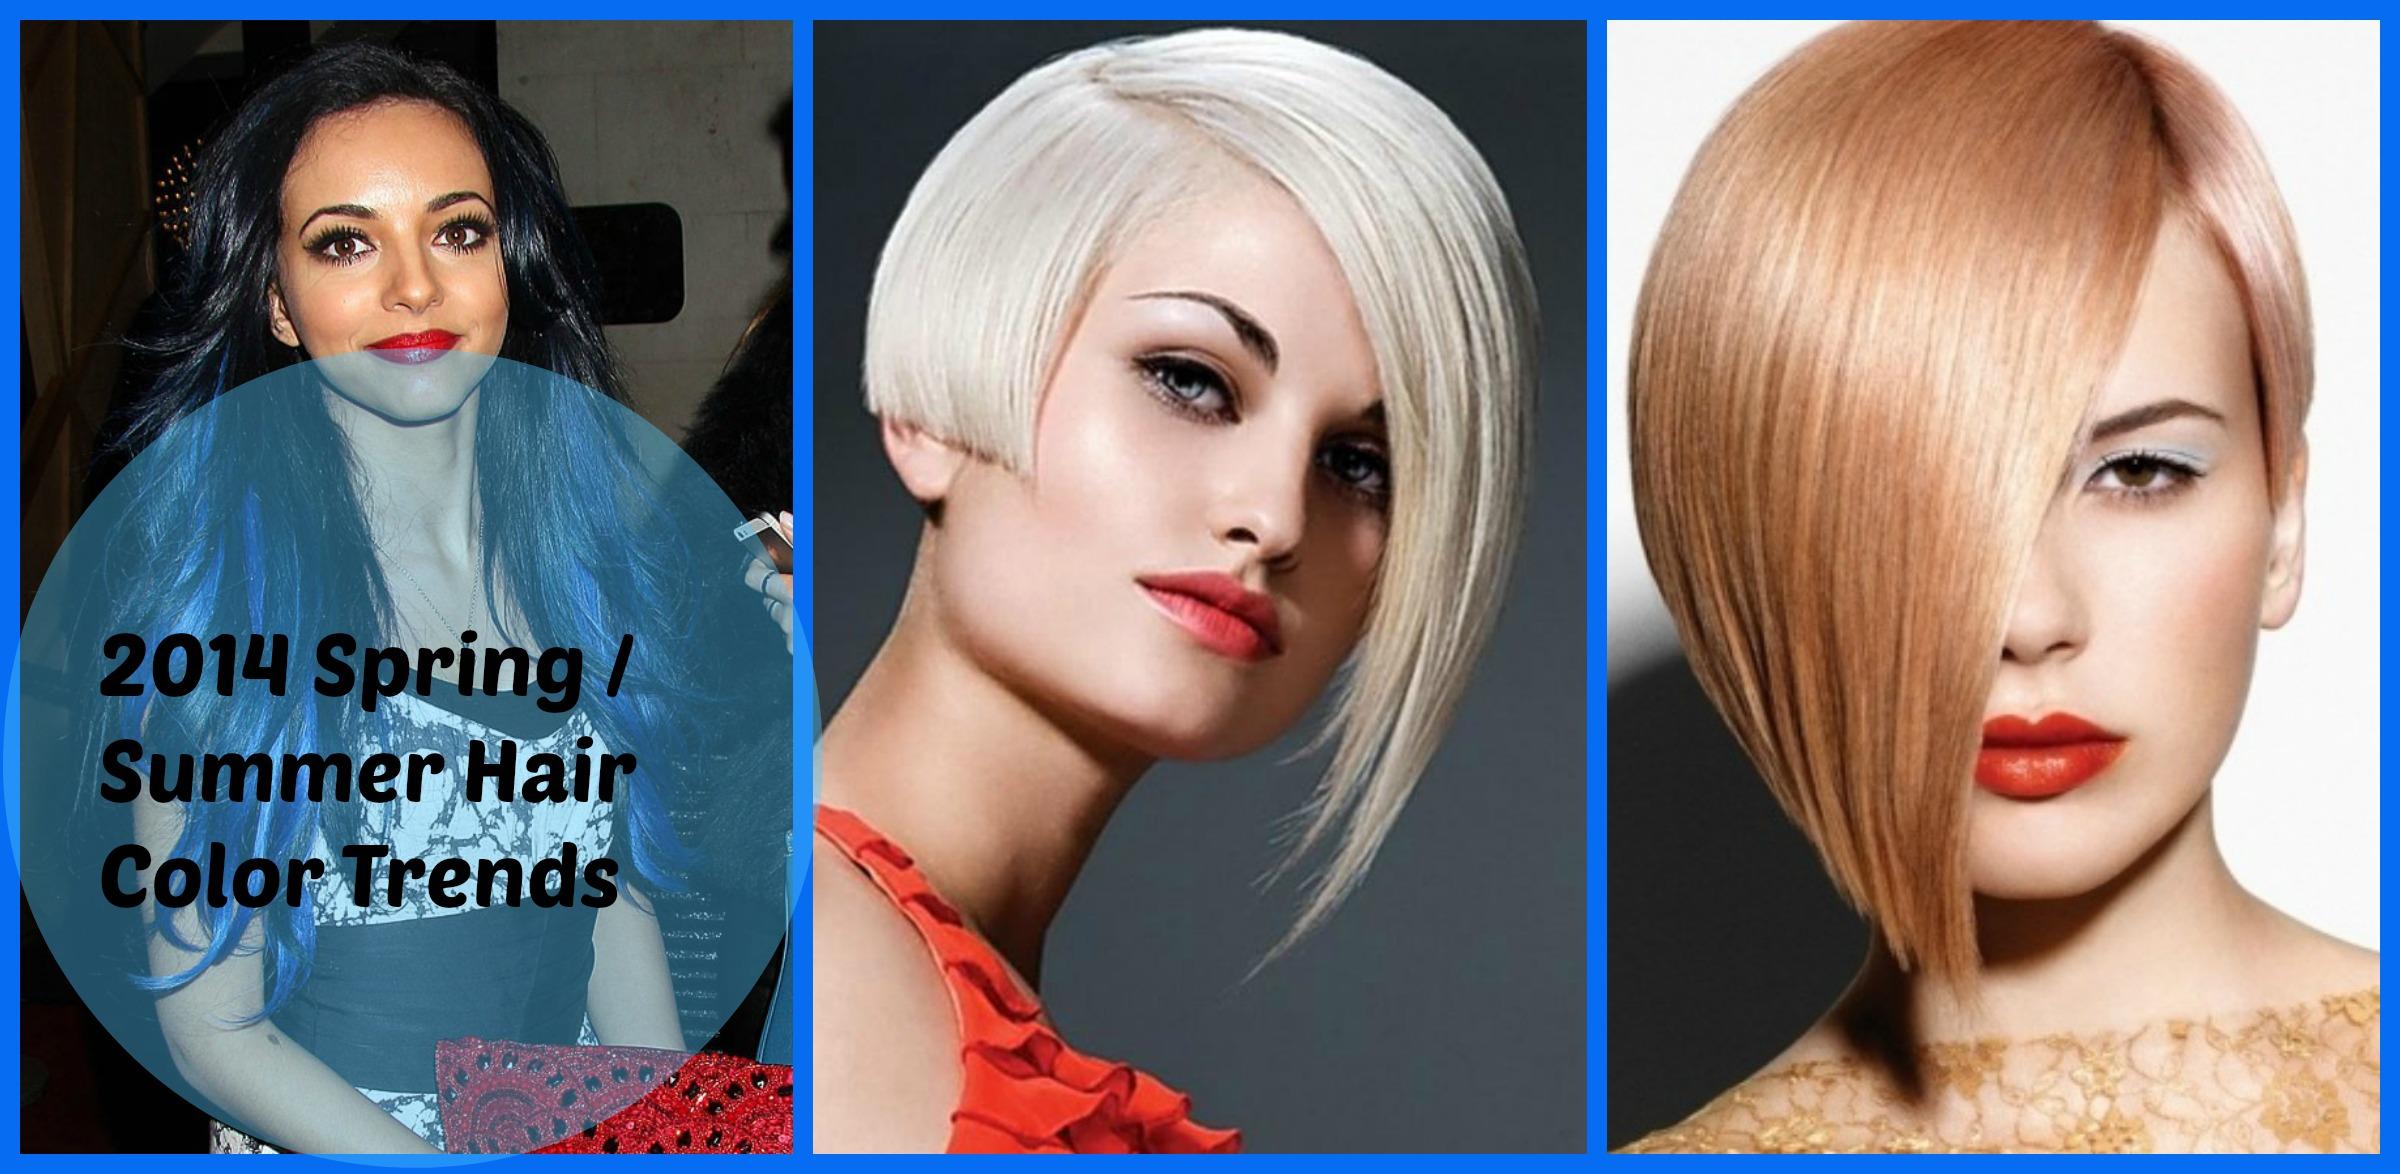 Tremendous 2014 Spring Summer Hair Color Trends Short Hairstyles Gunalazisus